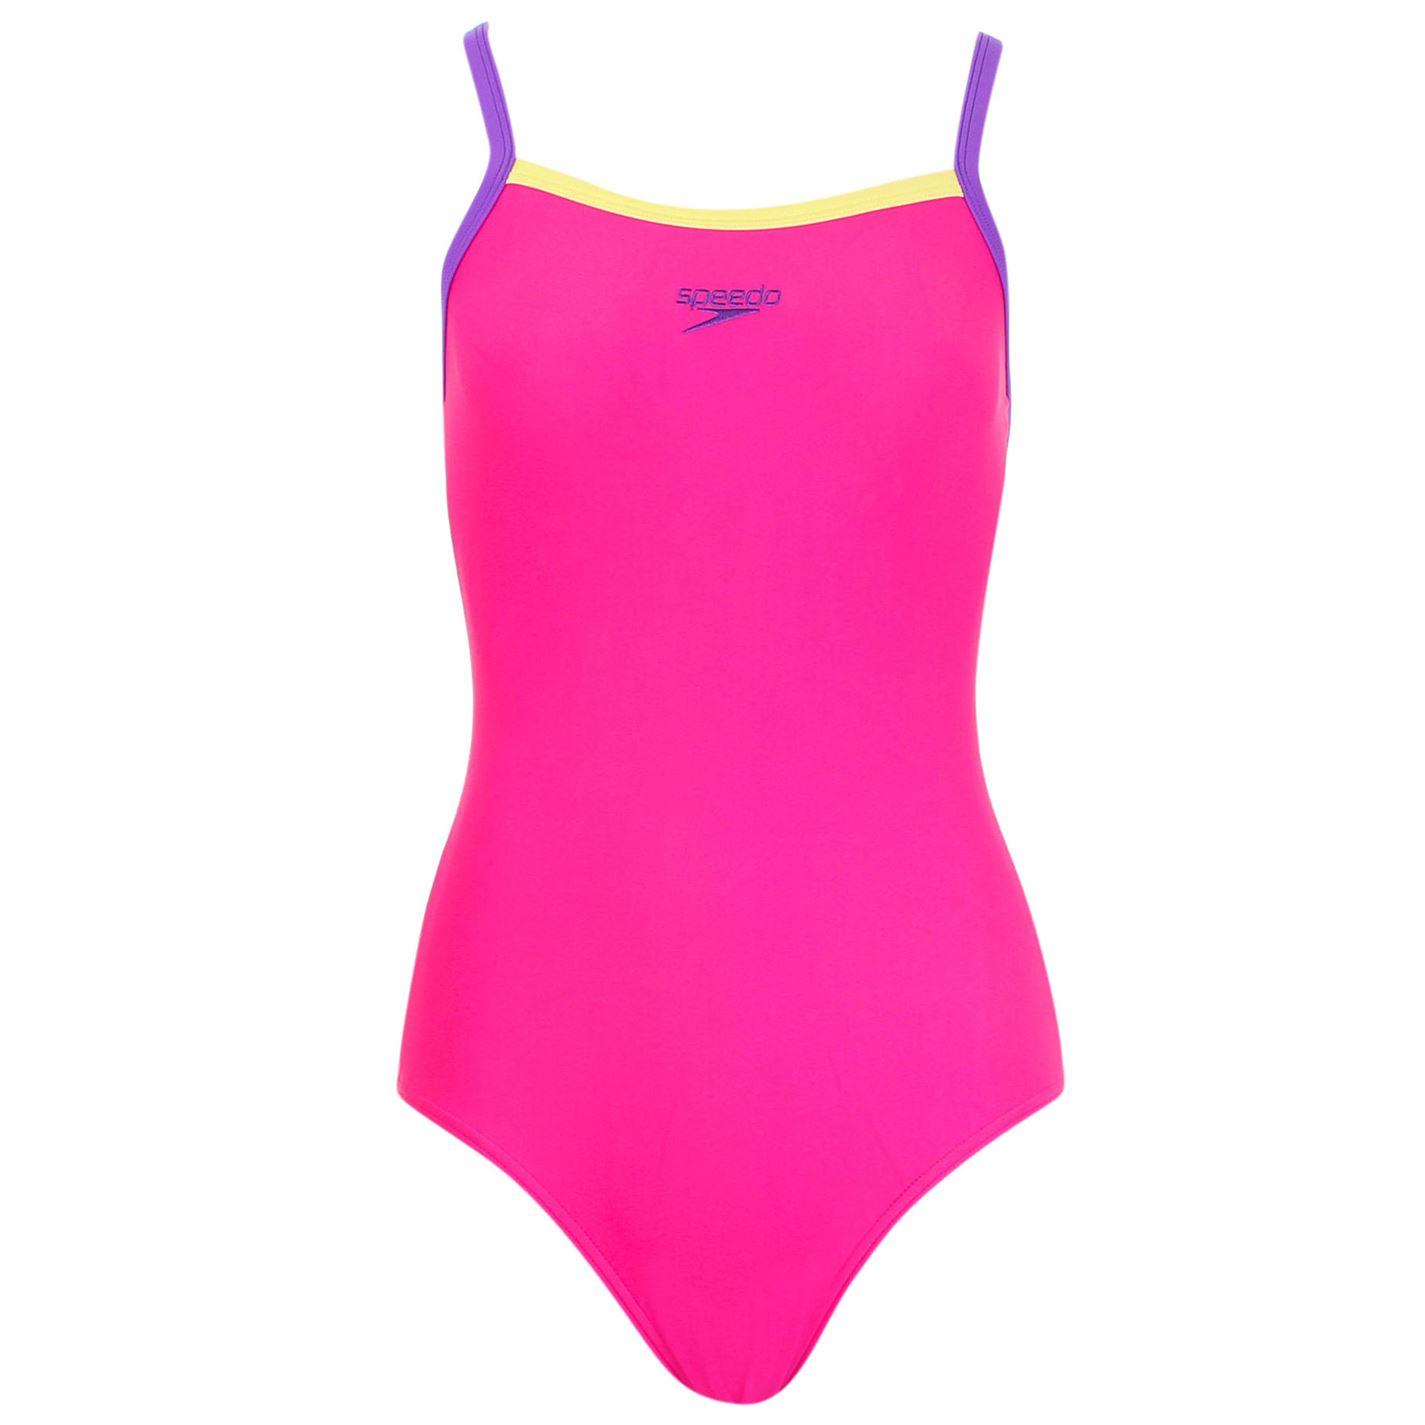 c211da72234 Dámske plavky Speedo Swimsuit Ladies - Glami.sk